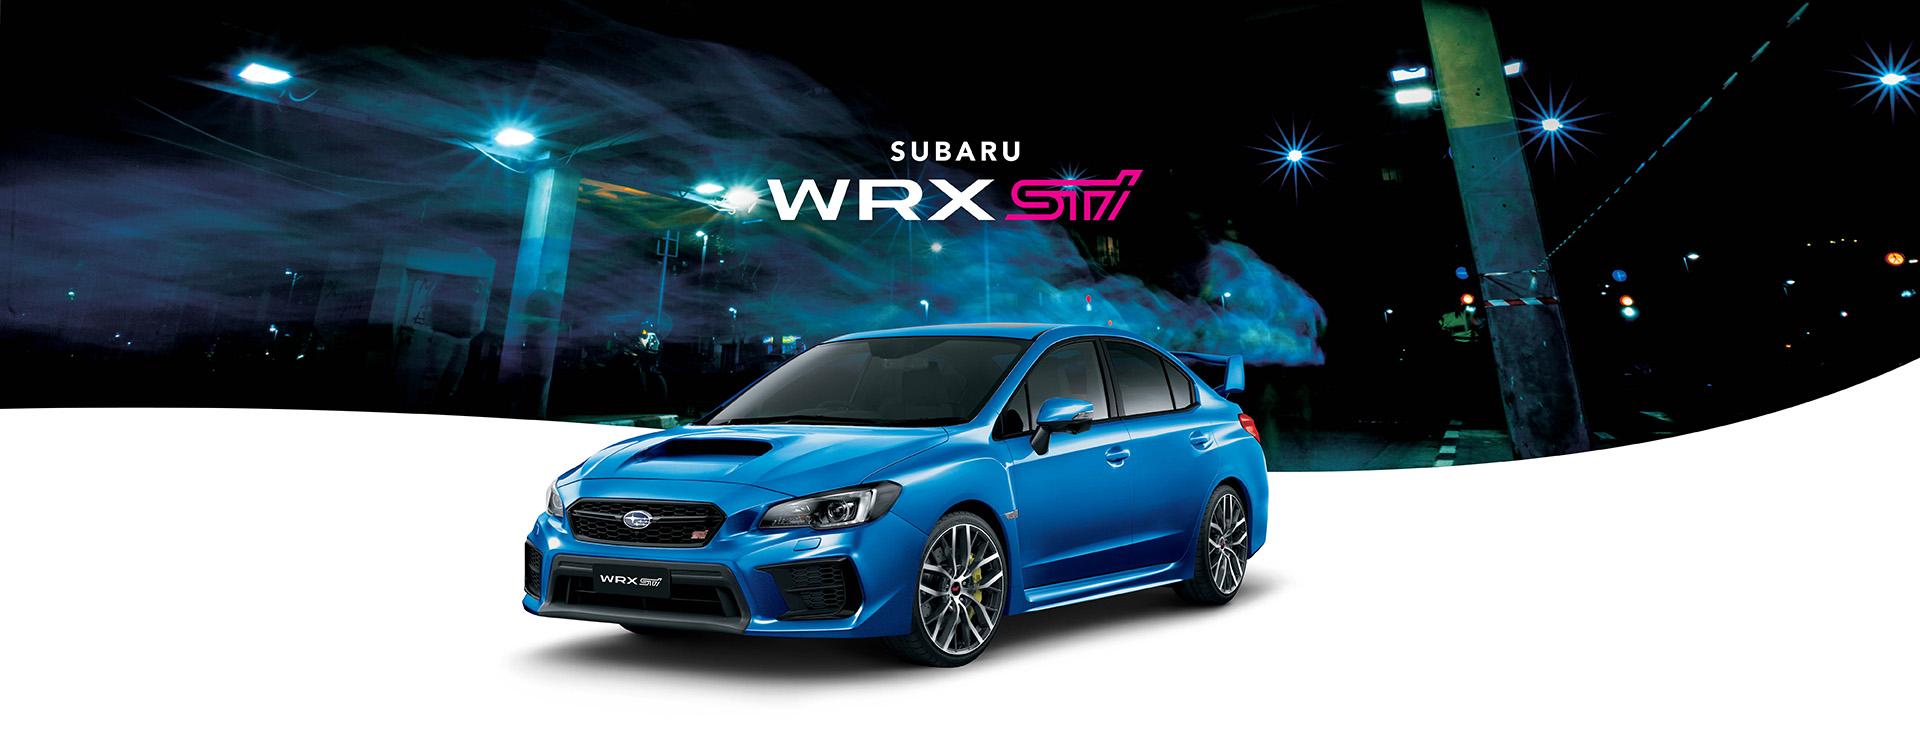 Must see WRX & WRX STI Image